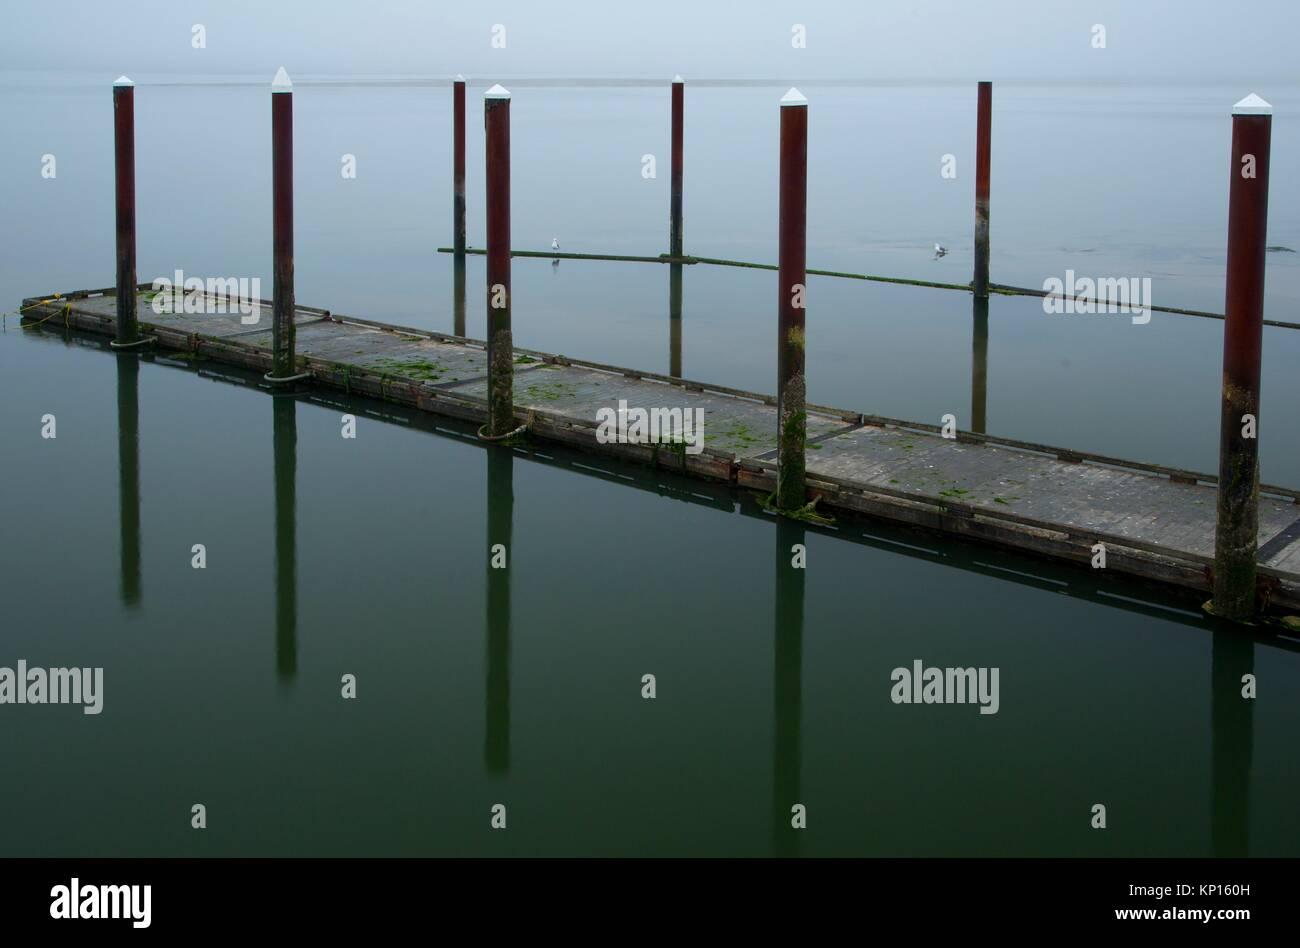 Port of Alsea Moorage Dock, Robinson Park, Waldport, Oregon. - Stock Image